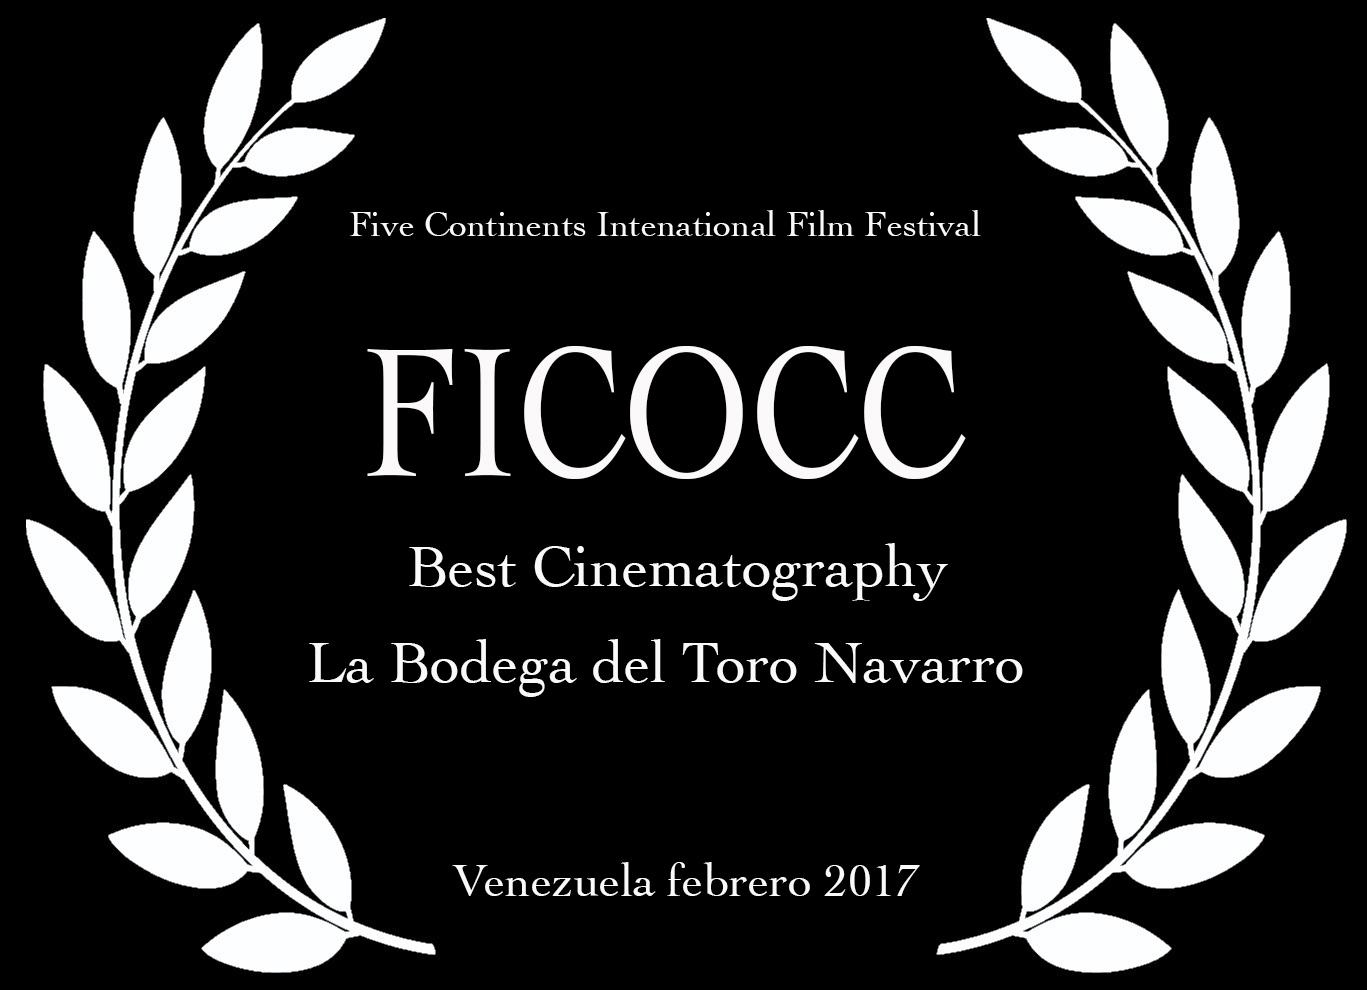 FICOCC.CINEMATOGRAPY